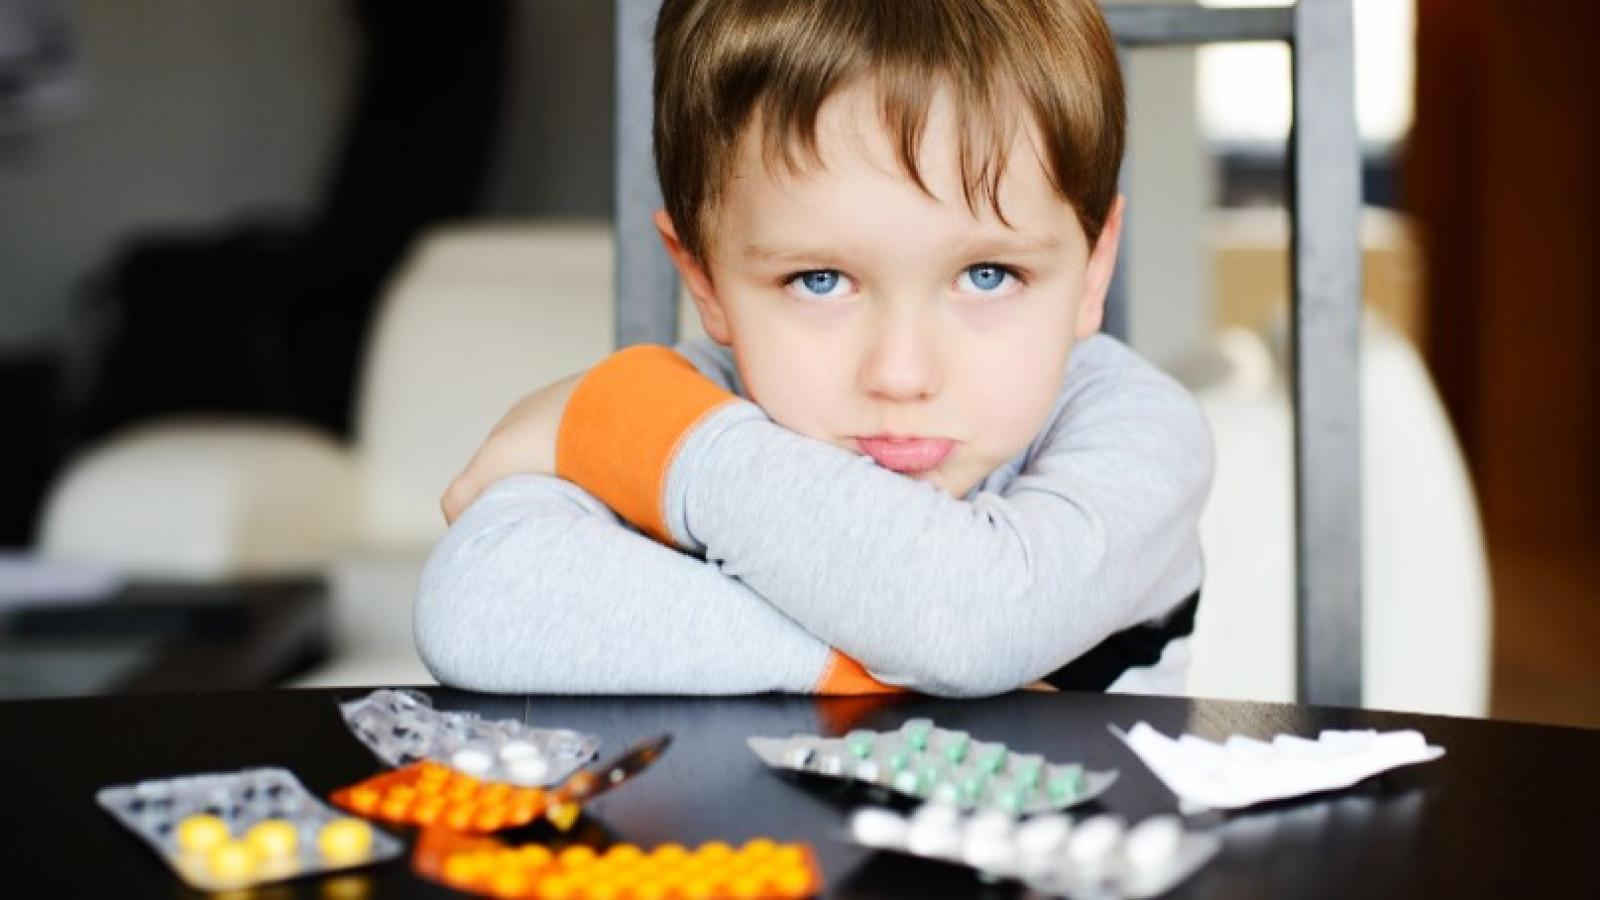 Прокуратура выбила 28 млн. руб. на лекарство ребёнку